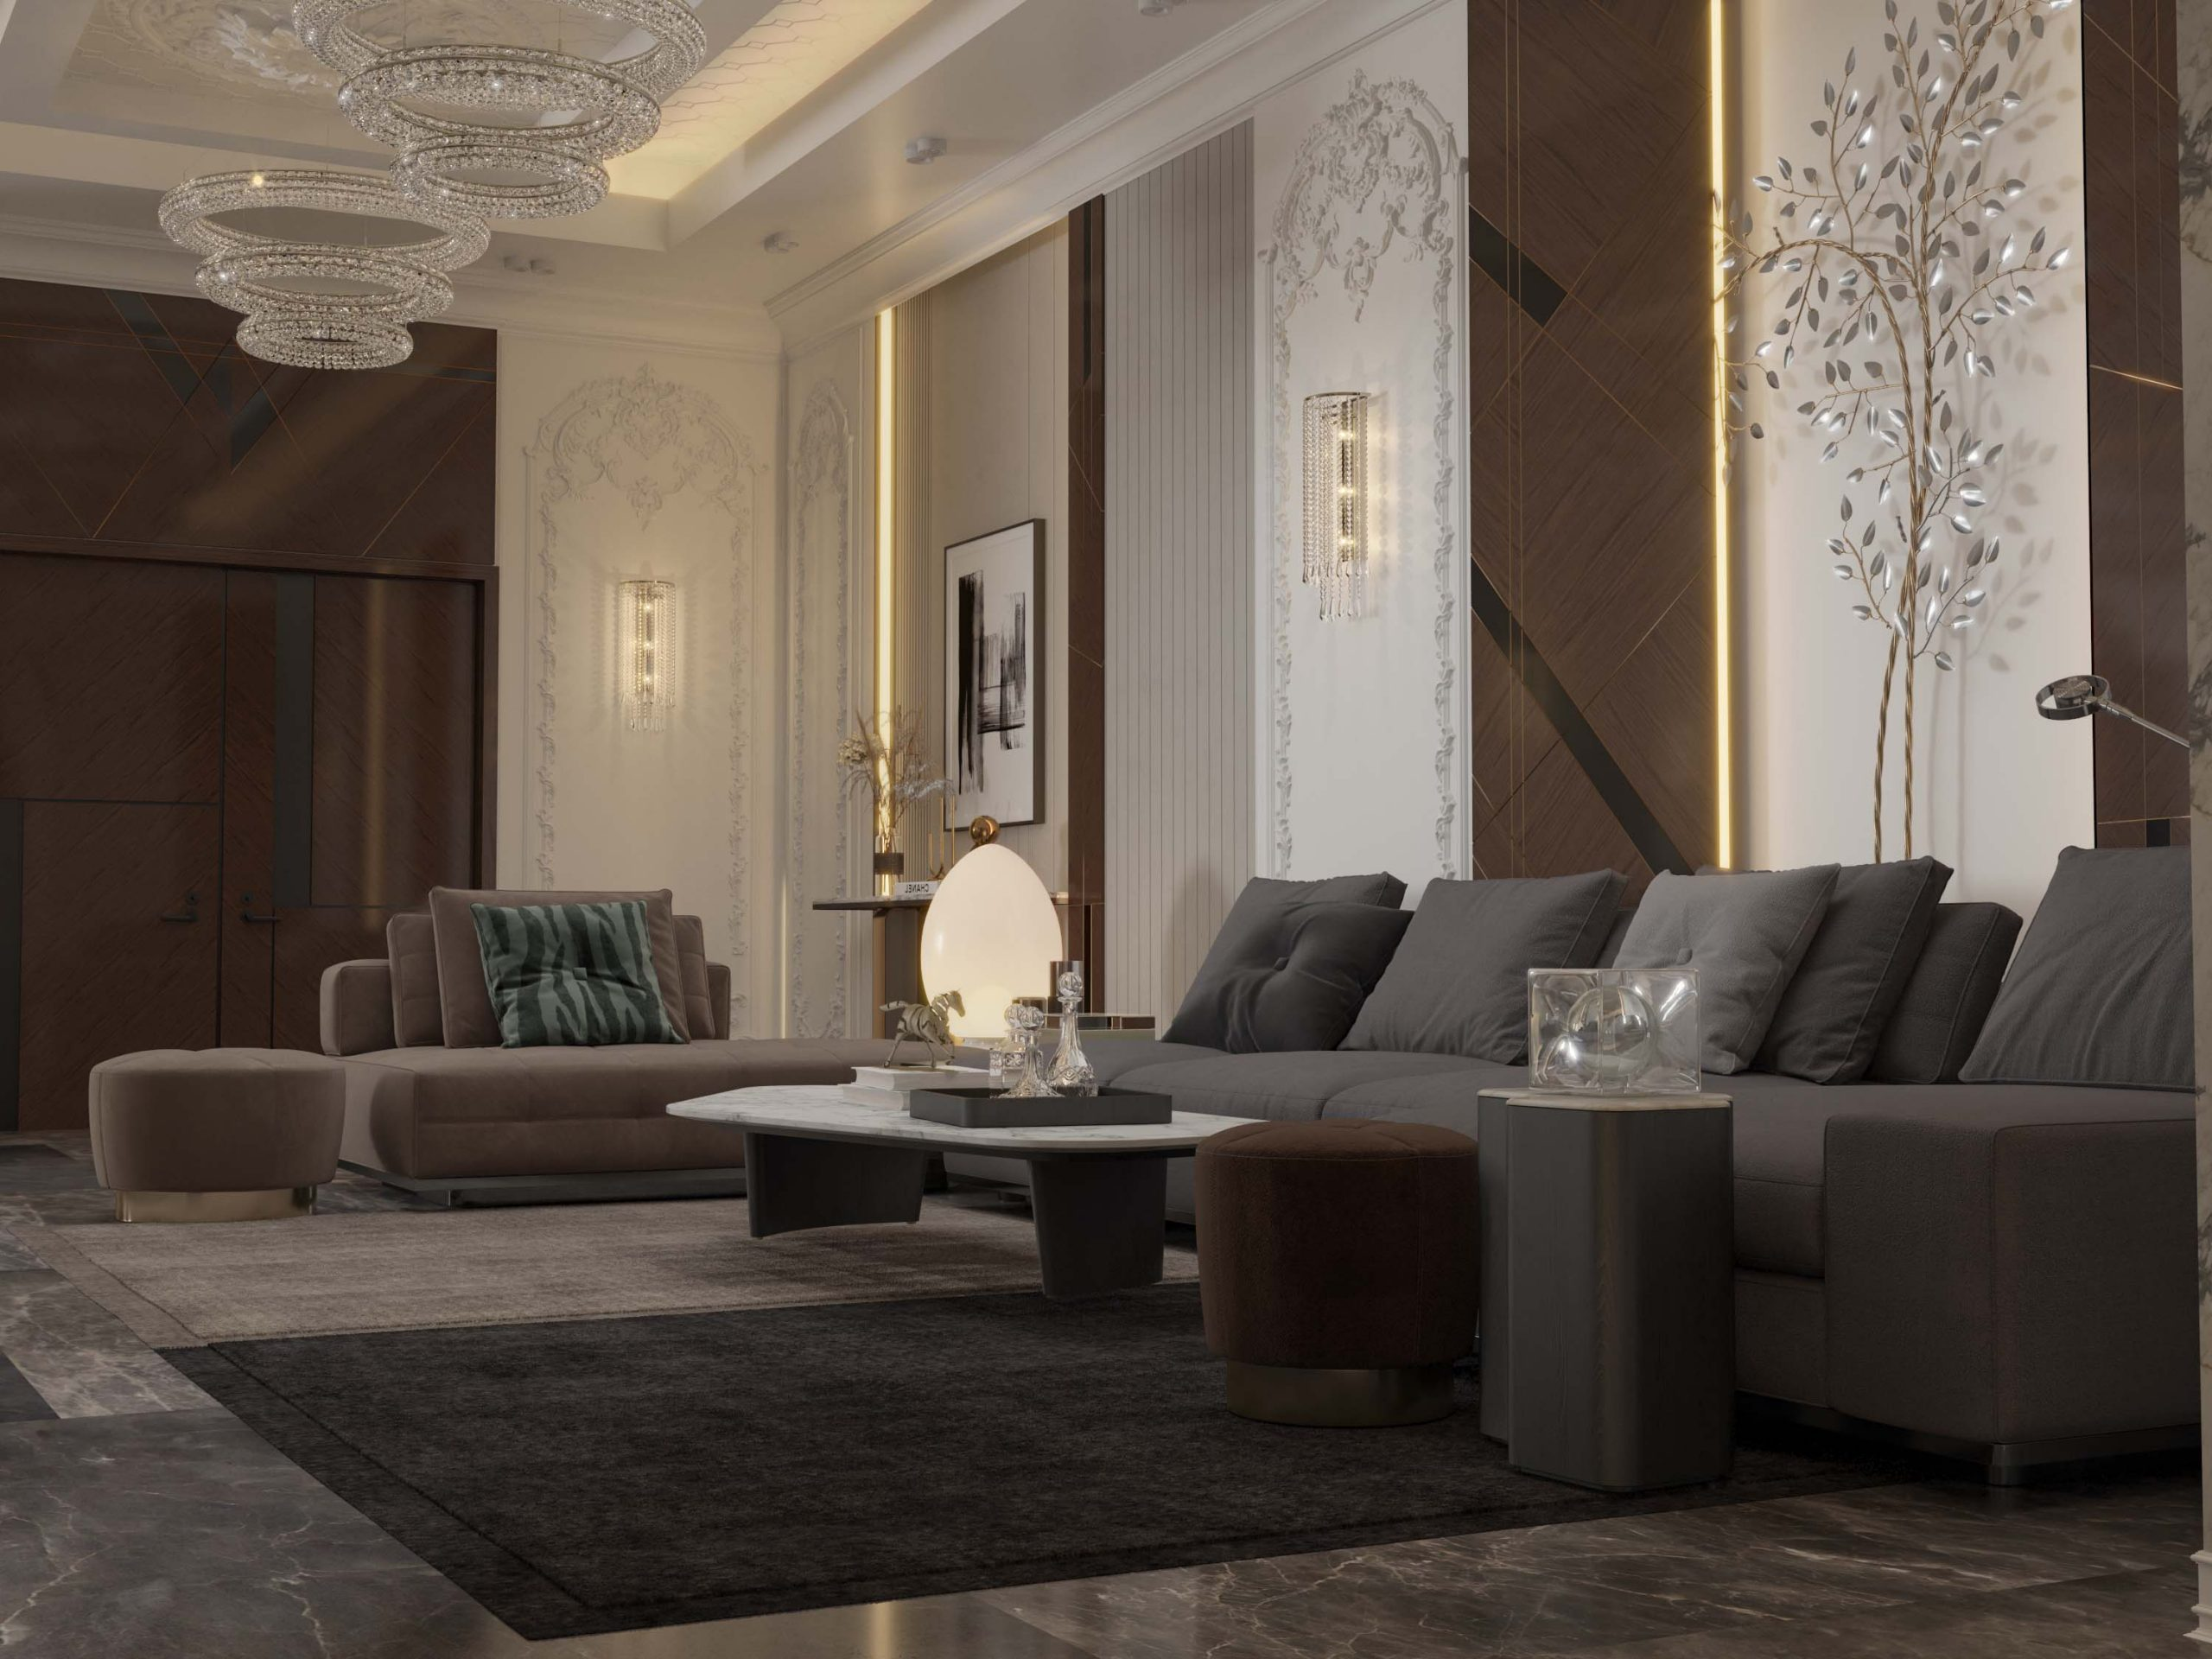 sitting area - sitting room - main hall - sofas